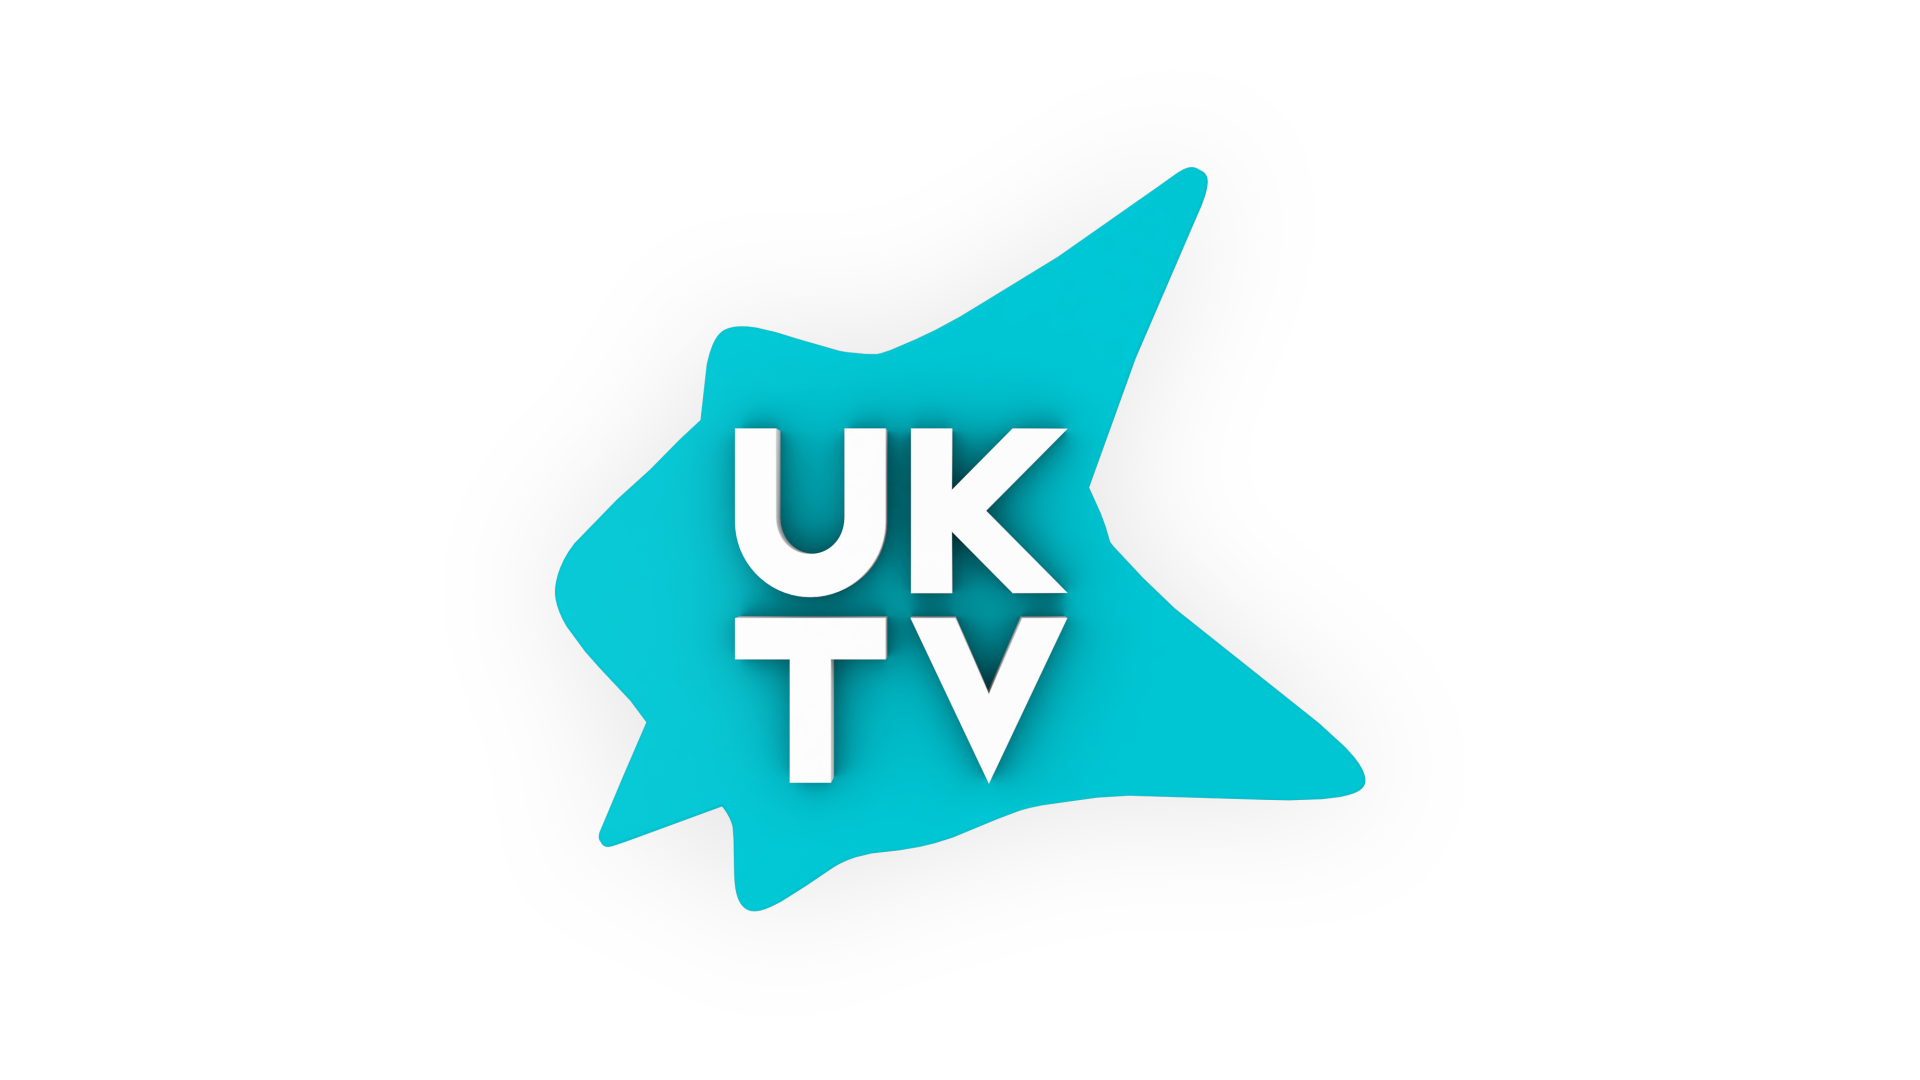 Uktv logo clipart png freeuse stock Work at UKTV as Vue.js developer - Vue.js Jobs png freeuse stock